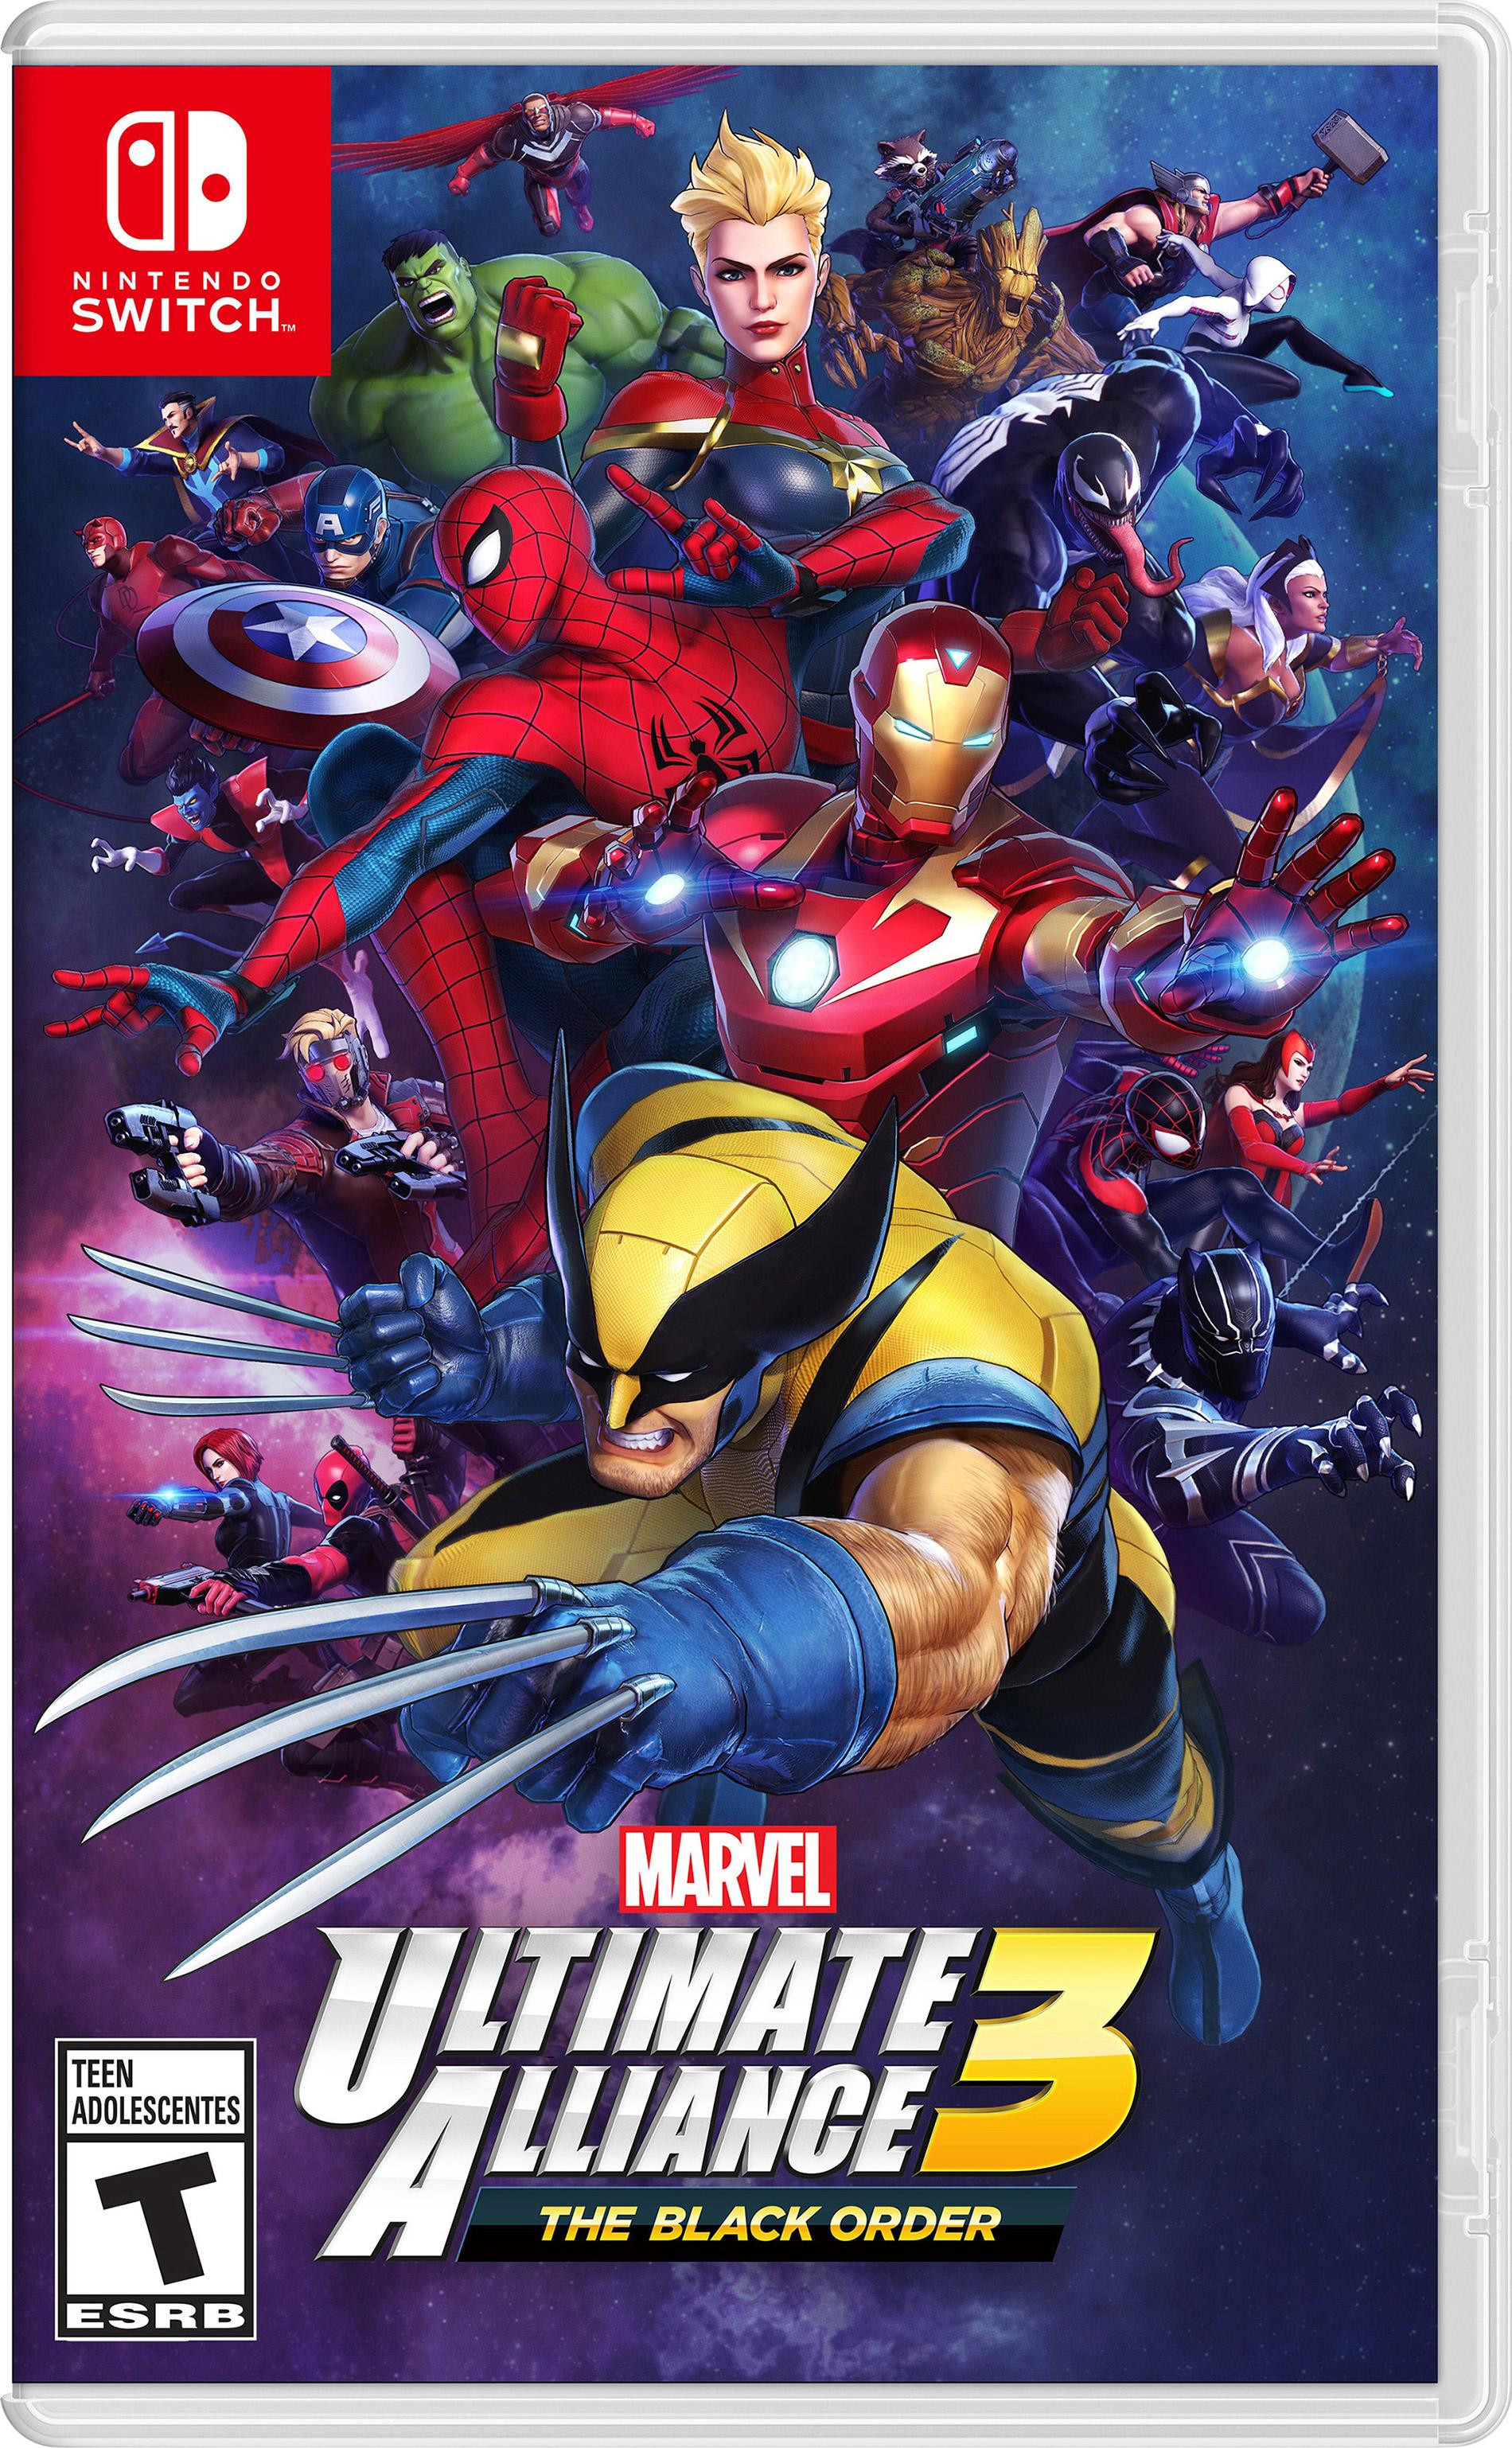 Marvel Ultimate Alliance 3 The Black Order Boxart